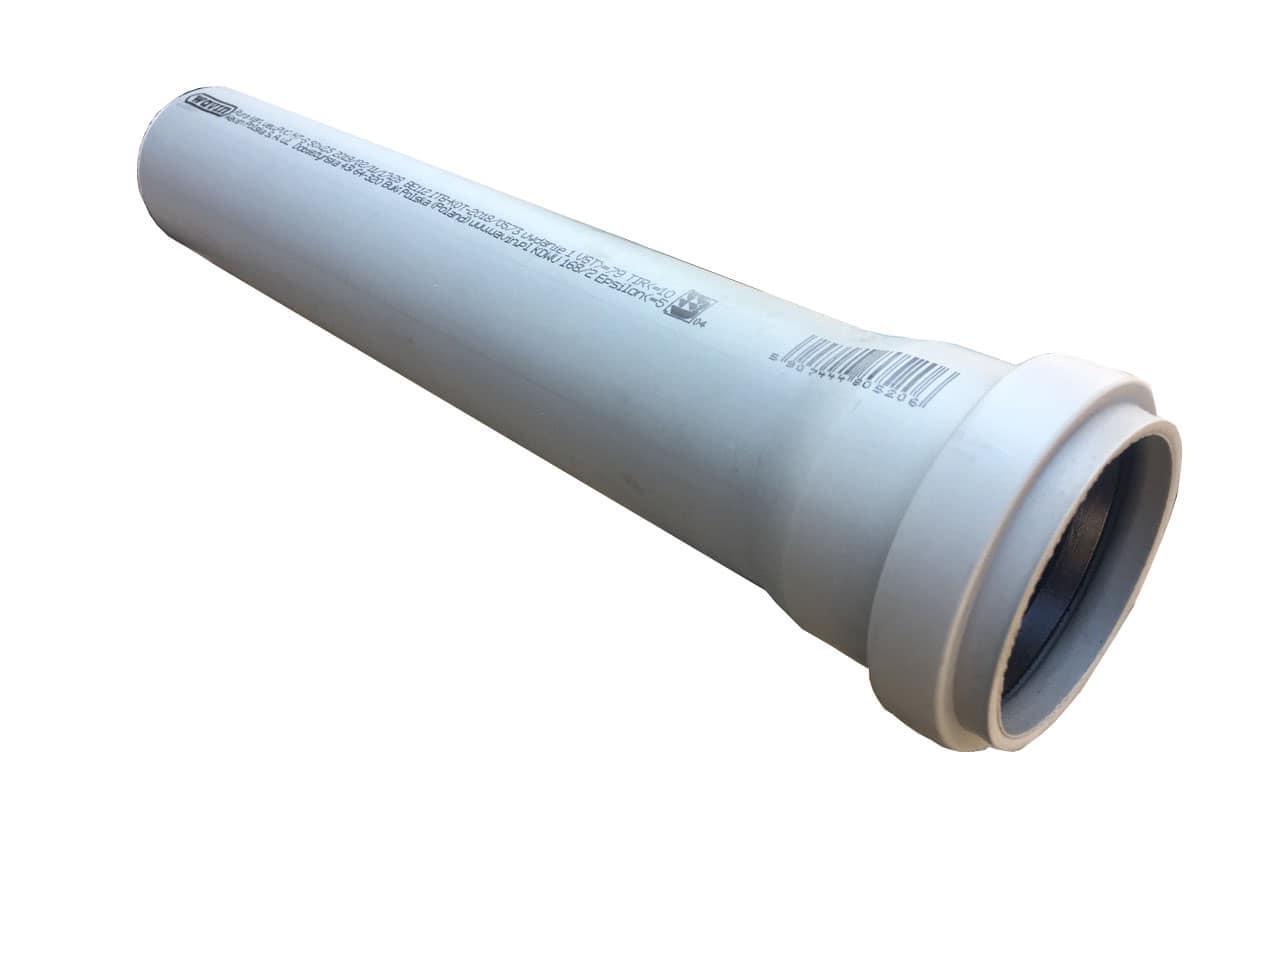 Труба для внутренней канализации 50*2 wavin